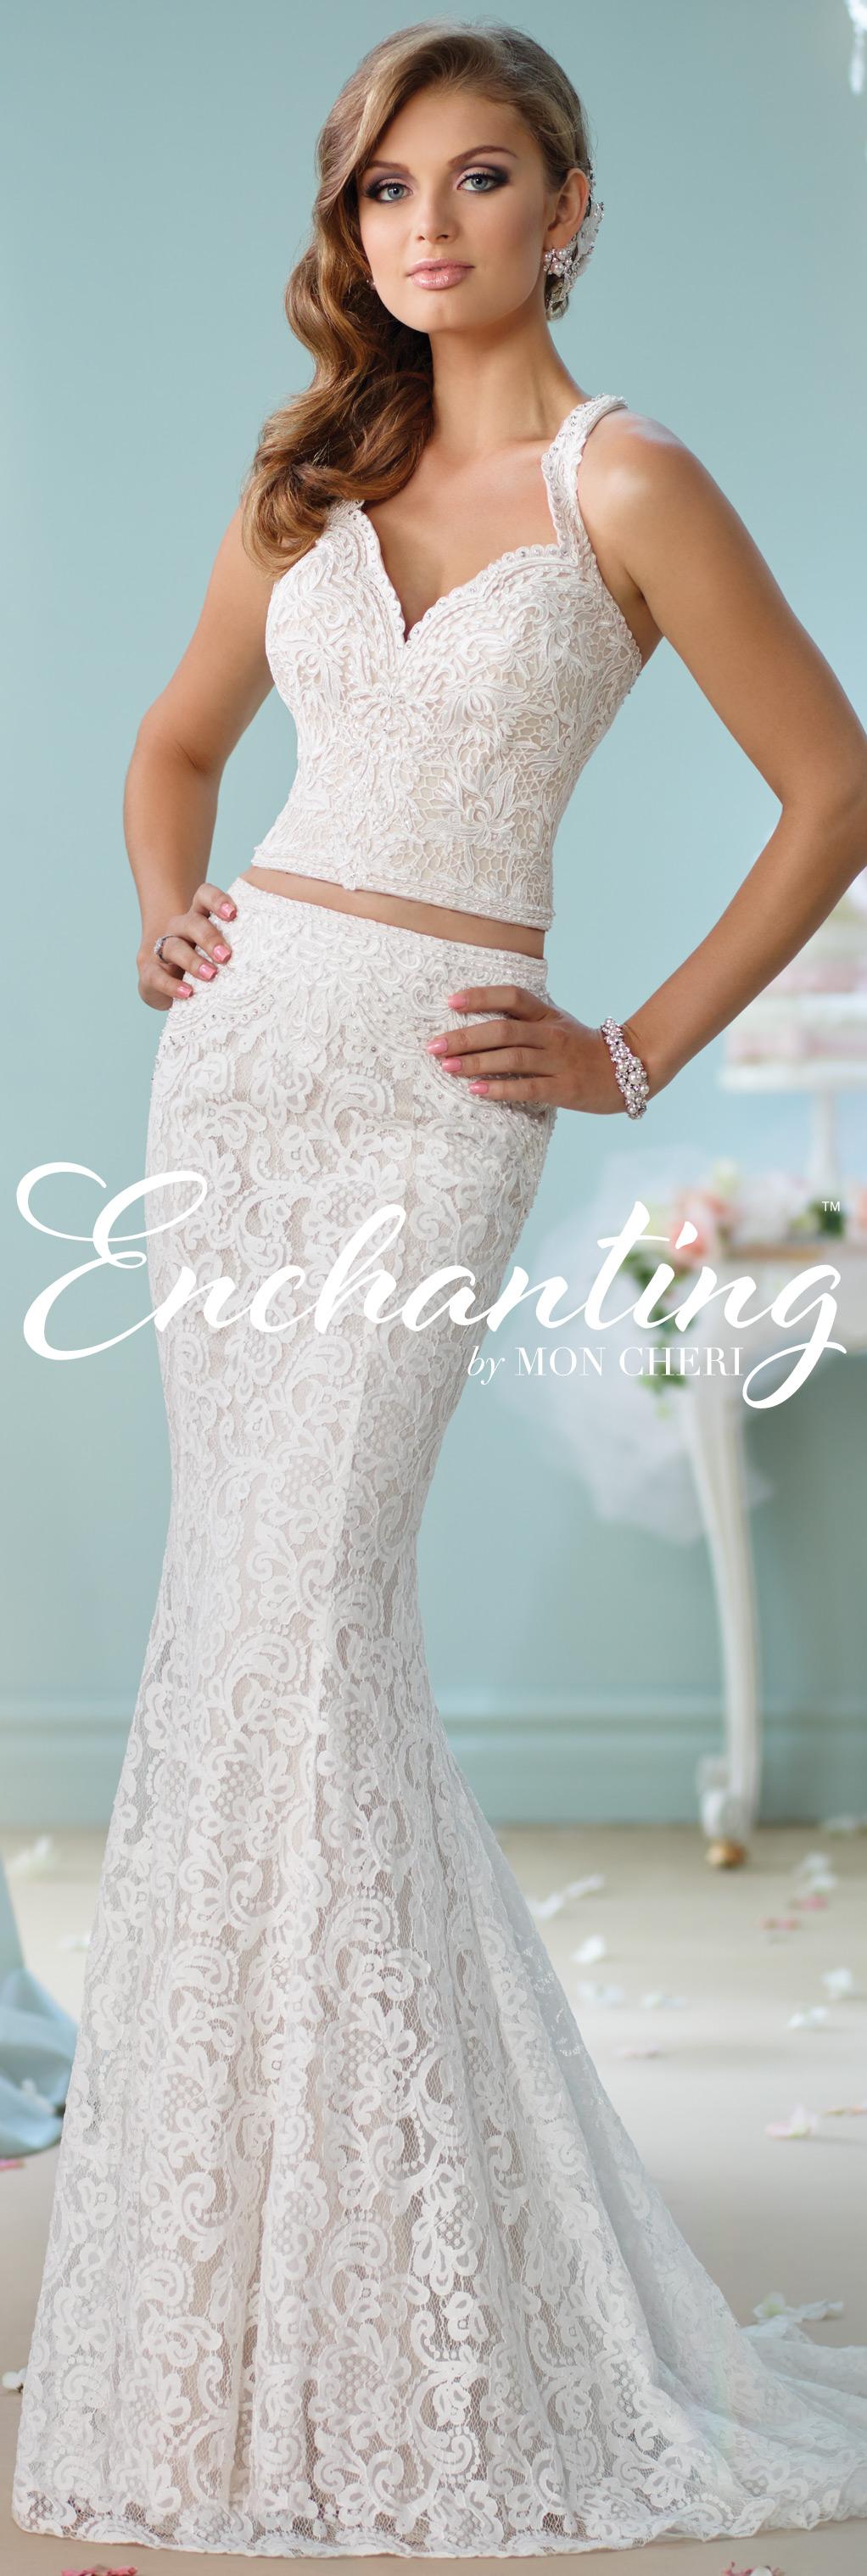 Modern Wedding Dresses 2018 by Mon Cheri | Vestidos de novia, De ...